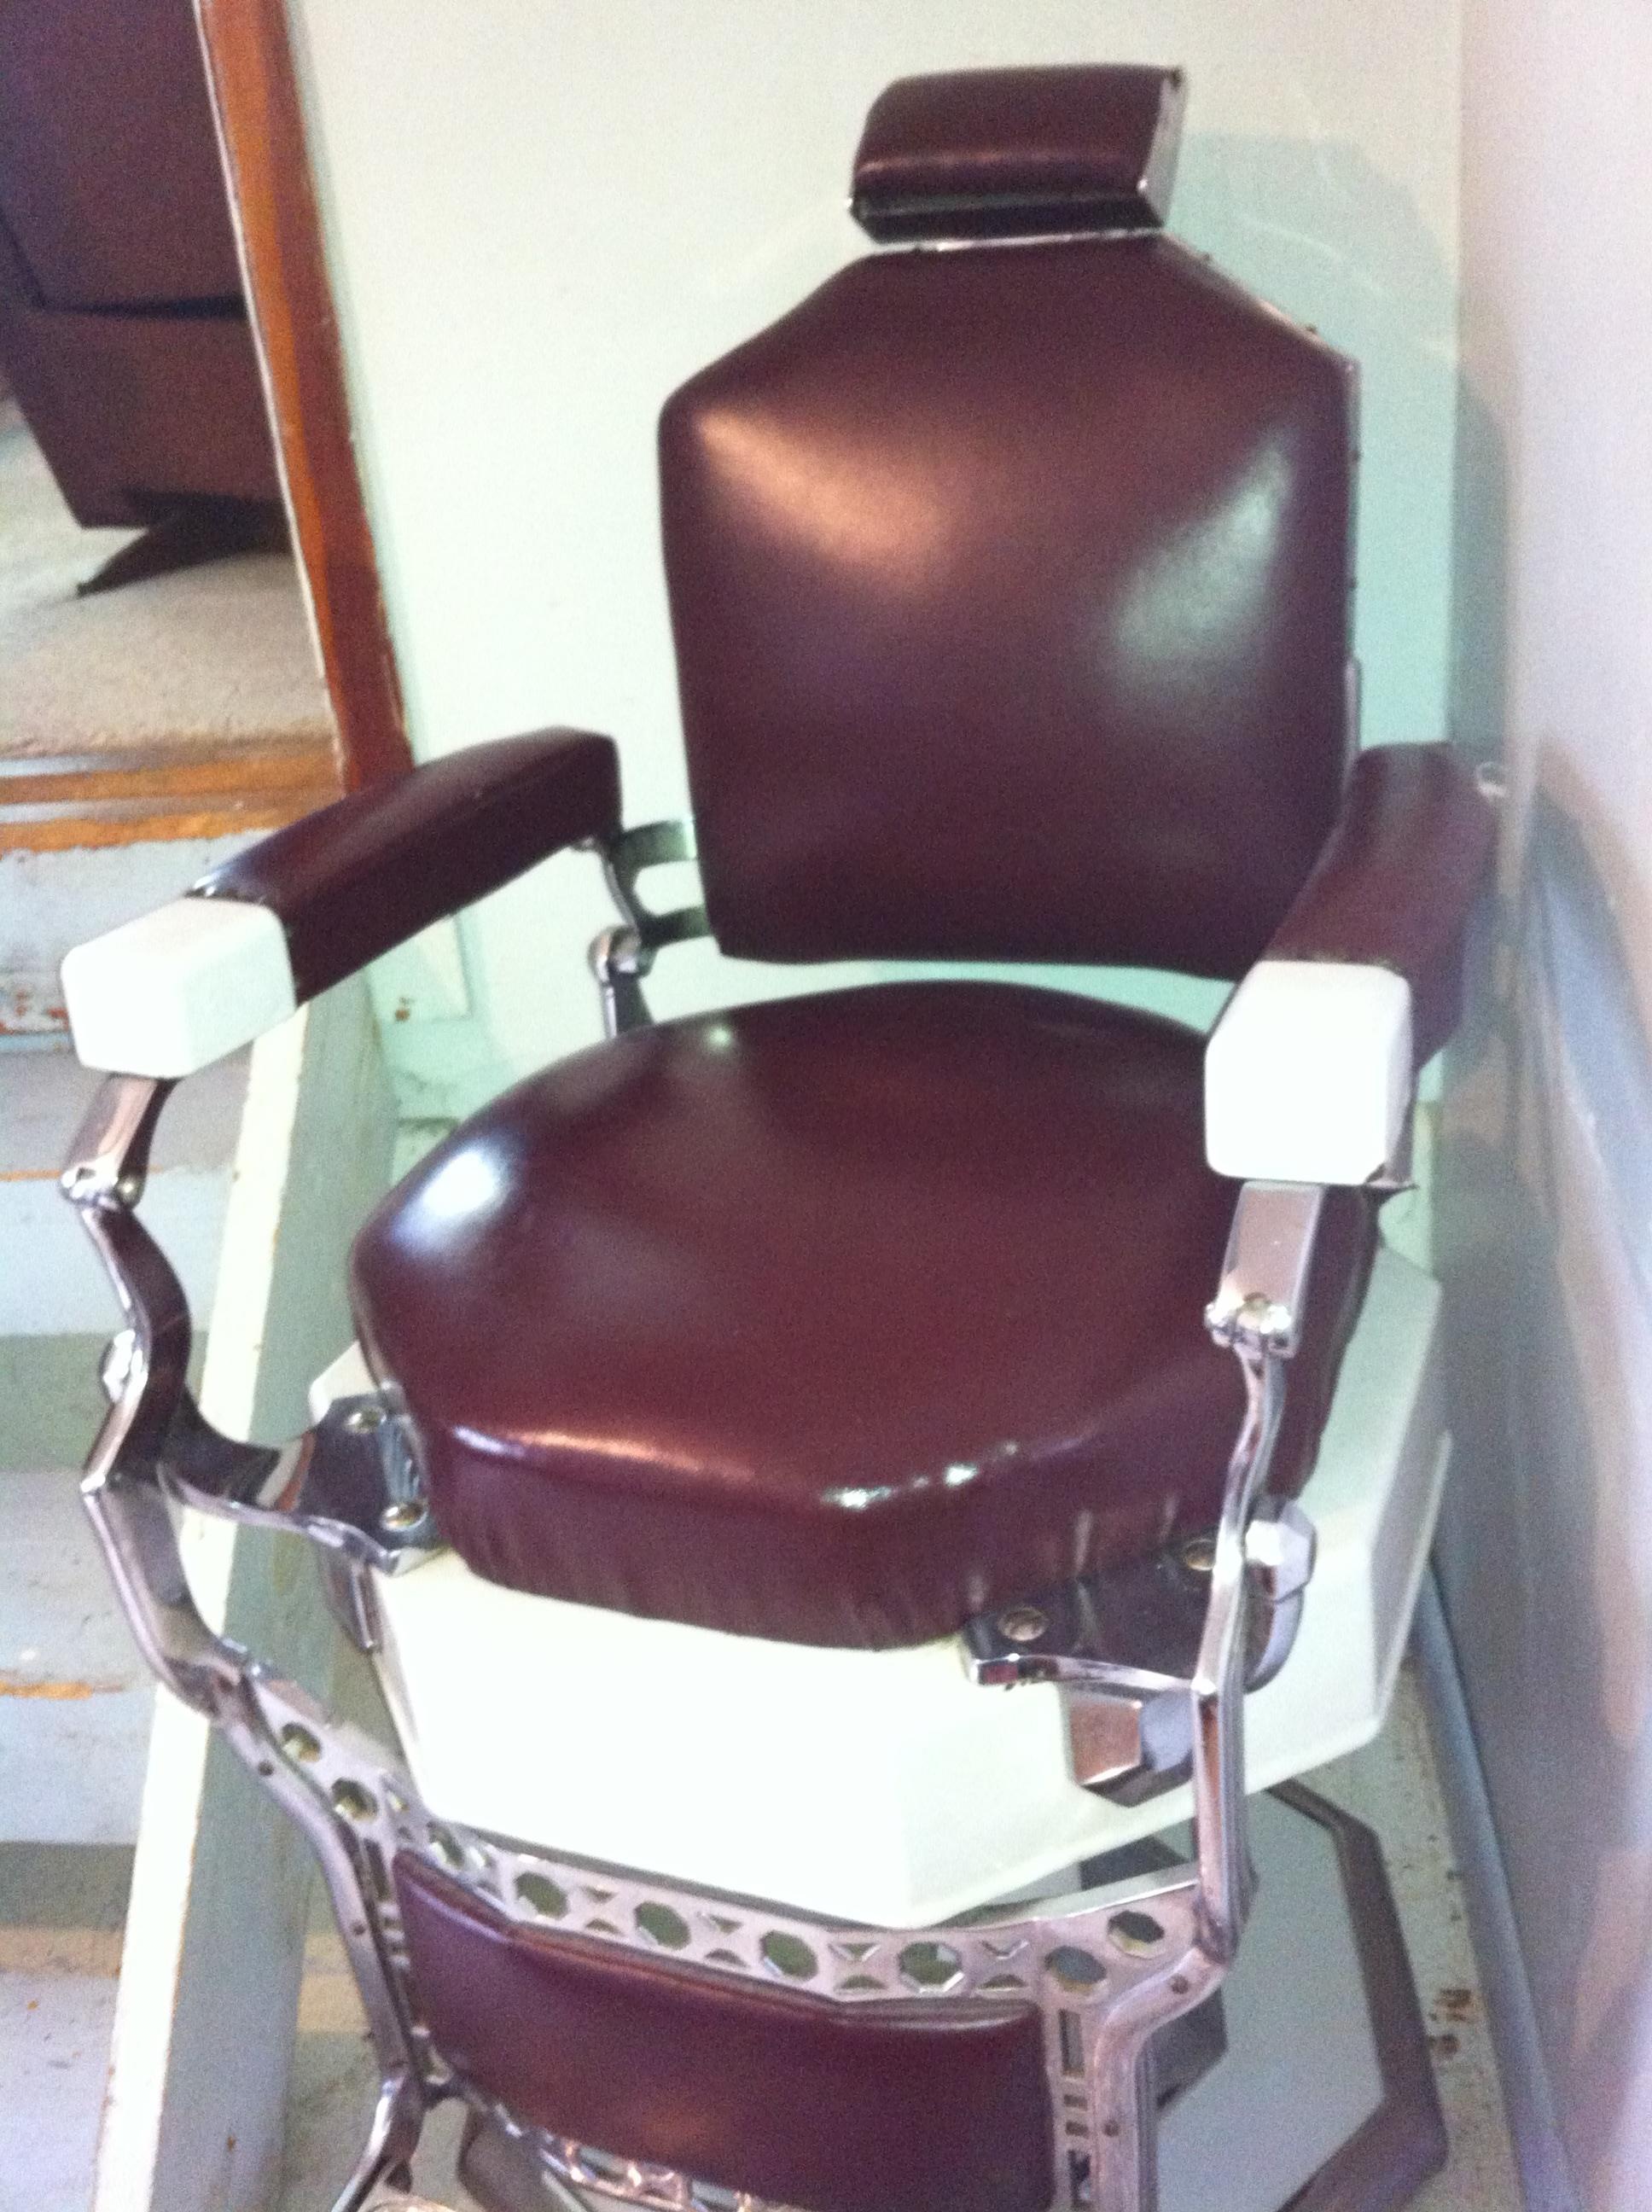 Antique Koken Barber Chair & Antique Koken Barber Chair antique appraisal | InstAppraisal